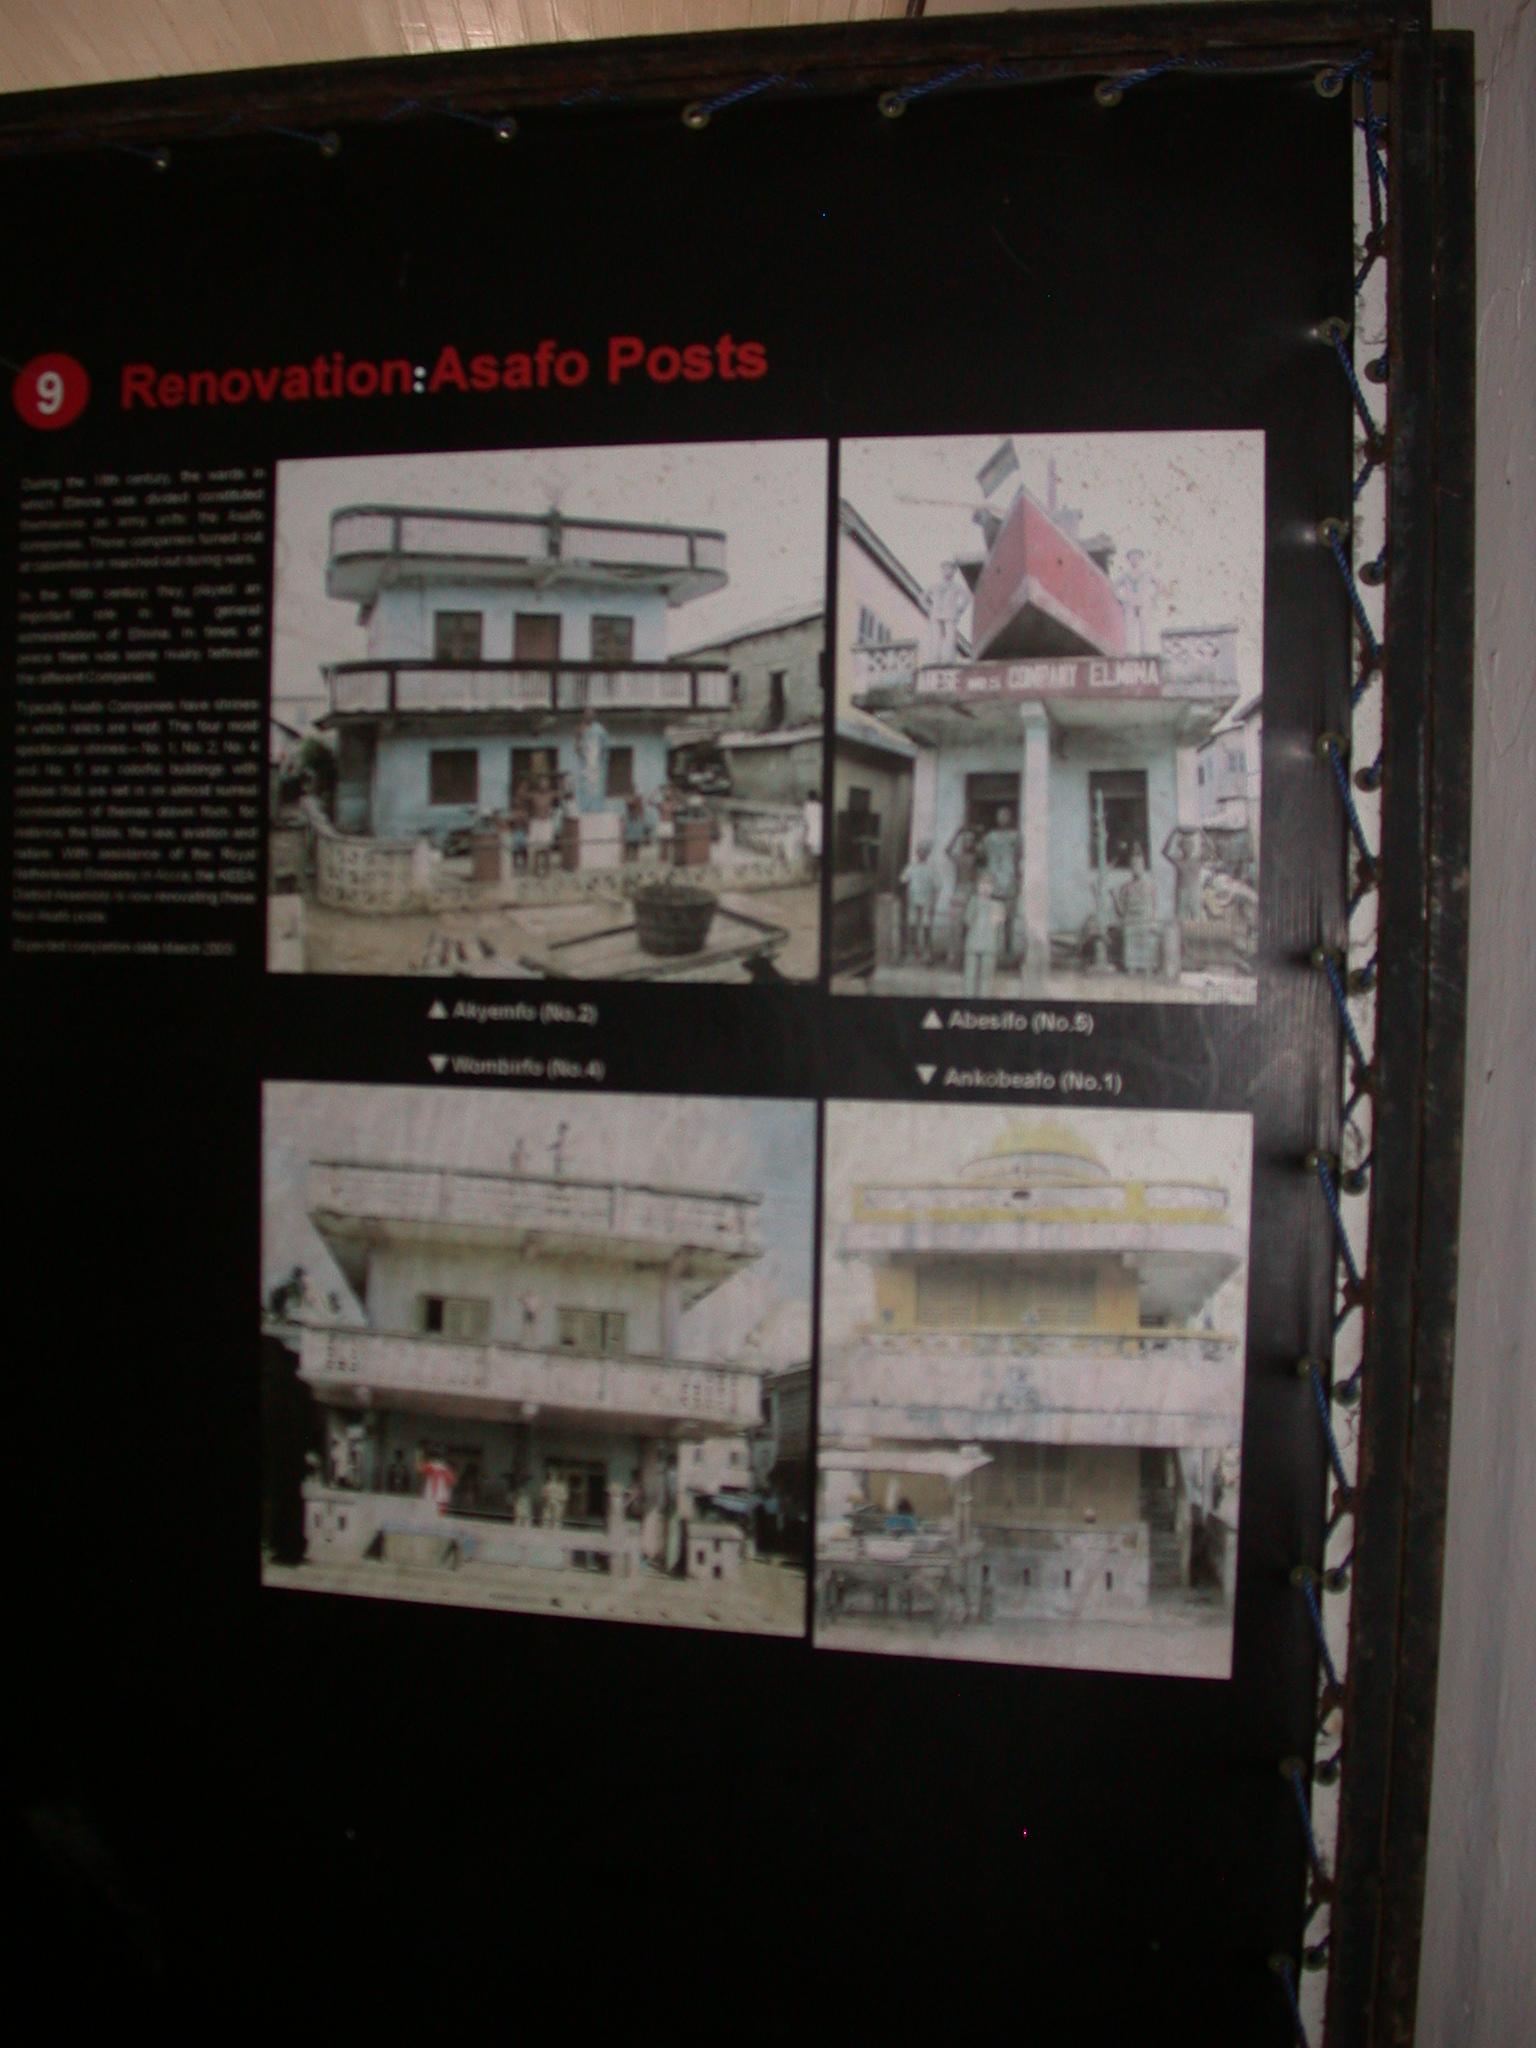 Renovation of Asafo Shrines, Elmina Slave Fort Exhibit, Elmina, Ghana